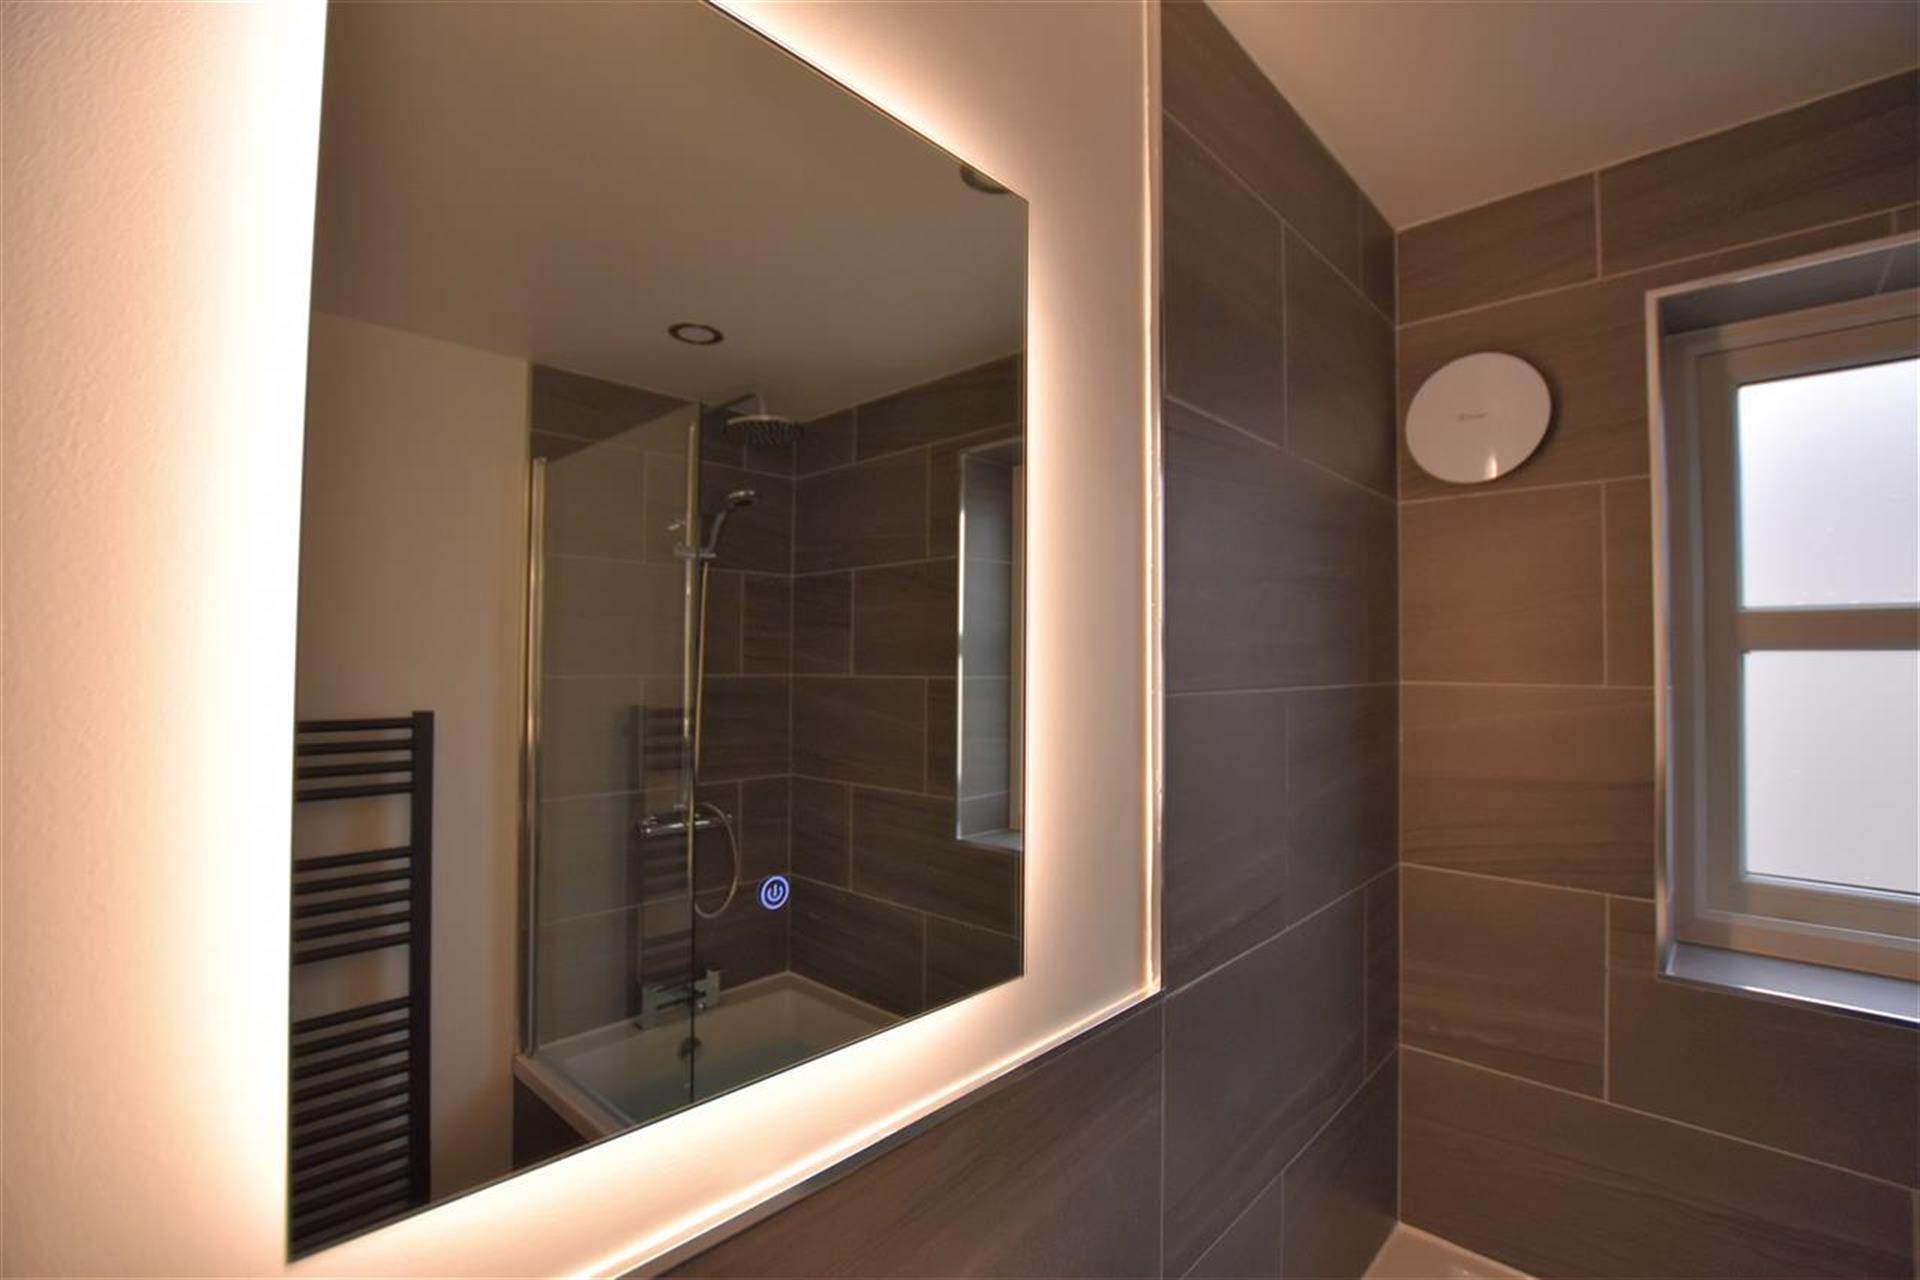 3 Bedroom House For Sale - Bathroom